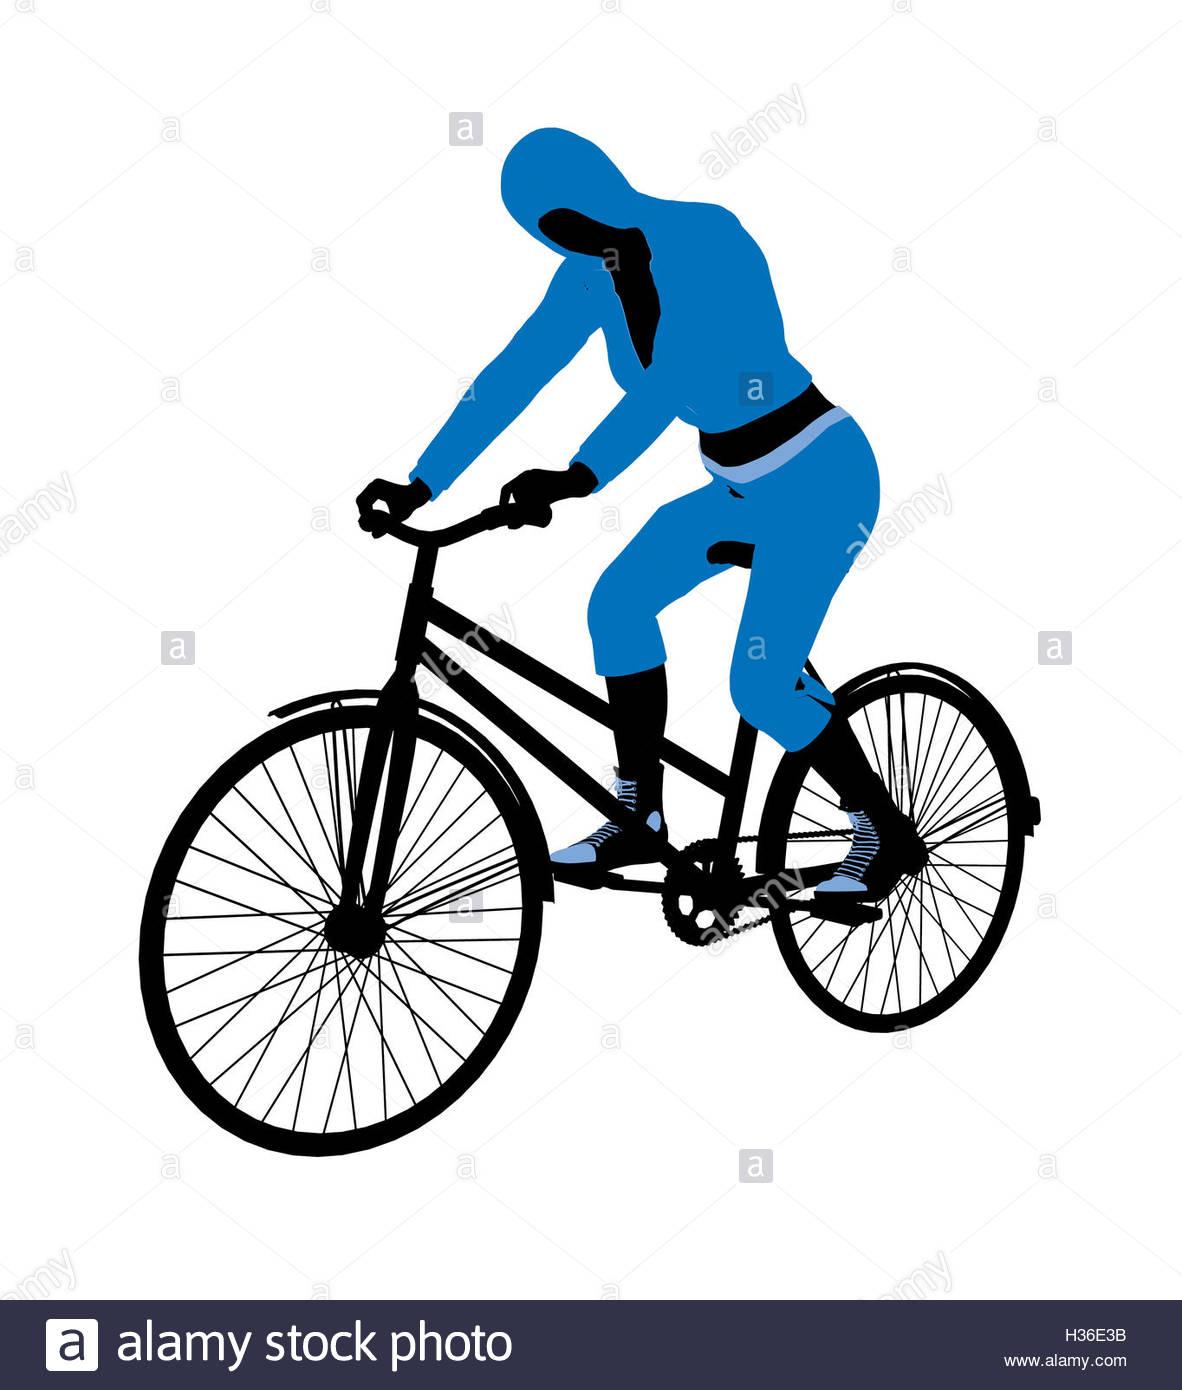 1182x1390 Bike Rider Illustration Stock Photos Amp Bike Rider Illustration